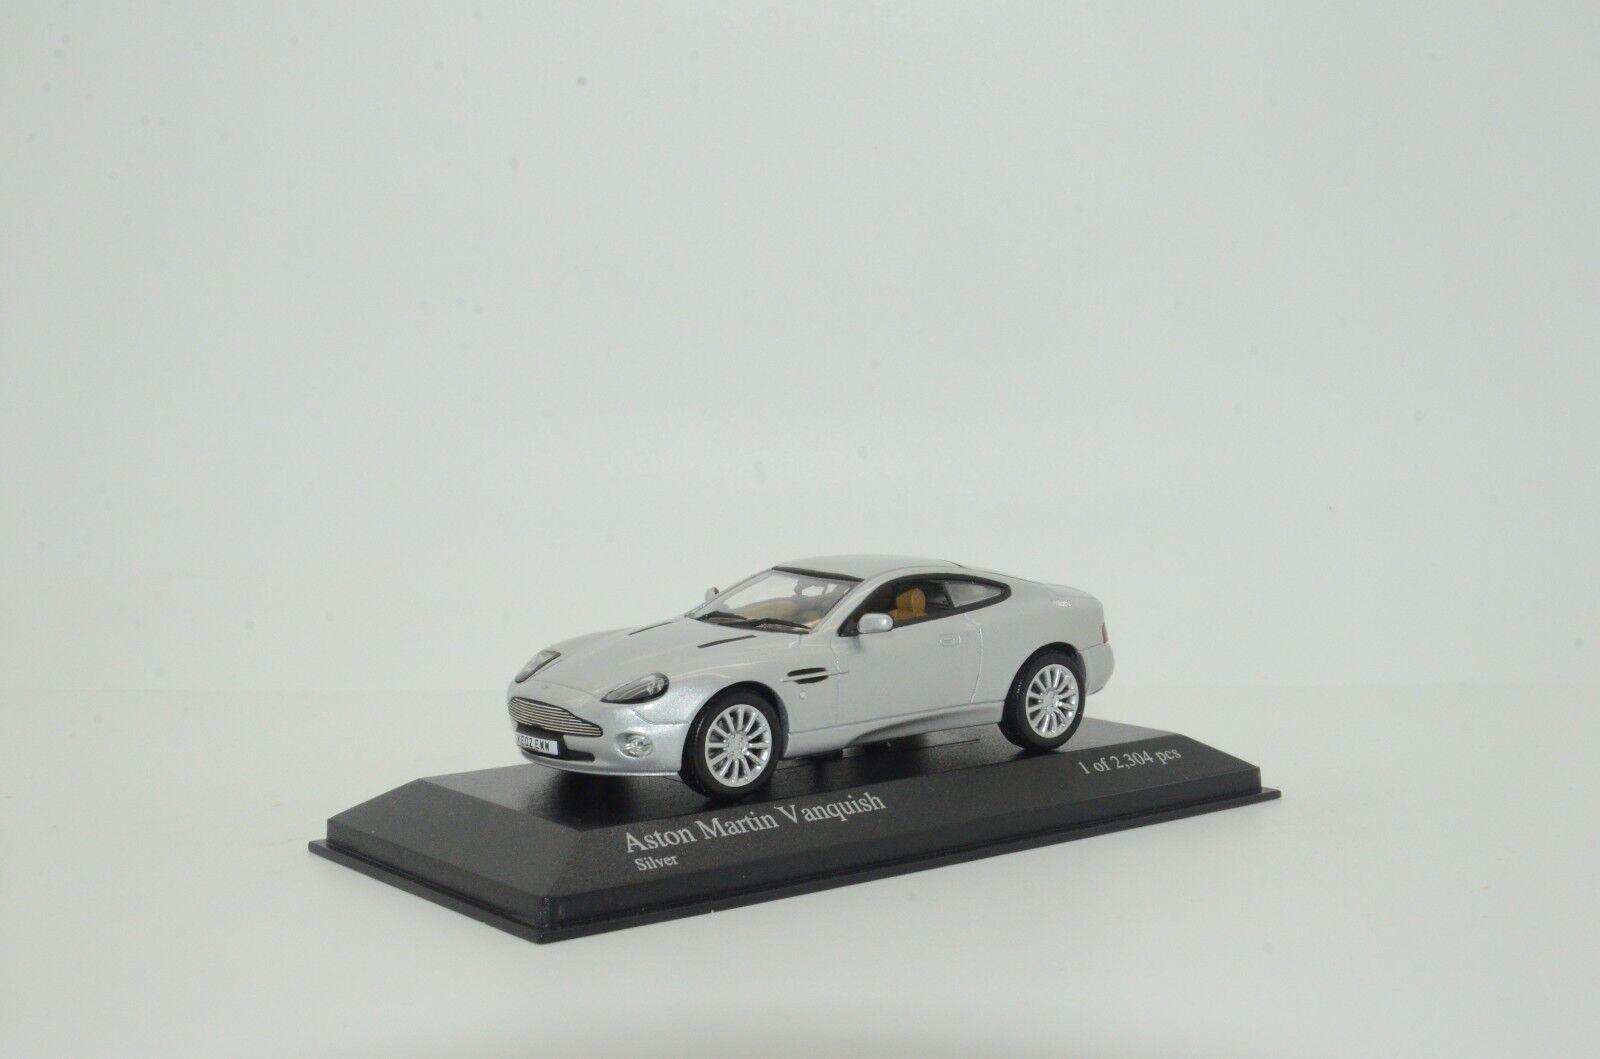 rara    Aston Martin Vanquish 2002 plata Minichamps 137224 1 43